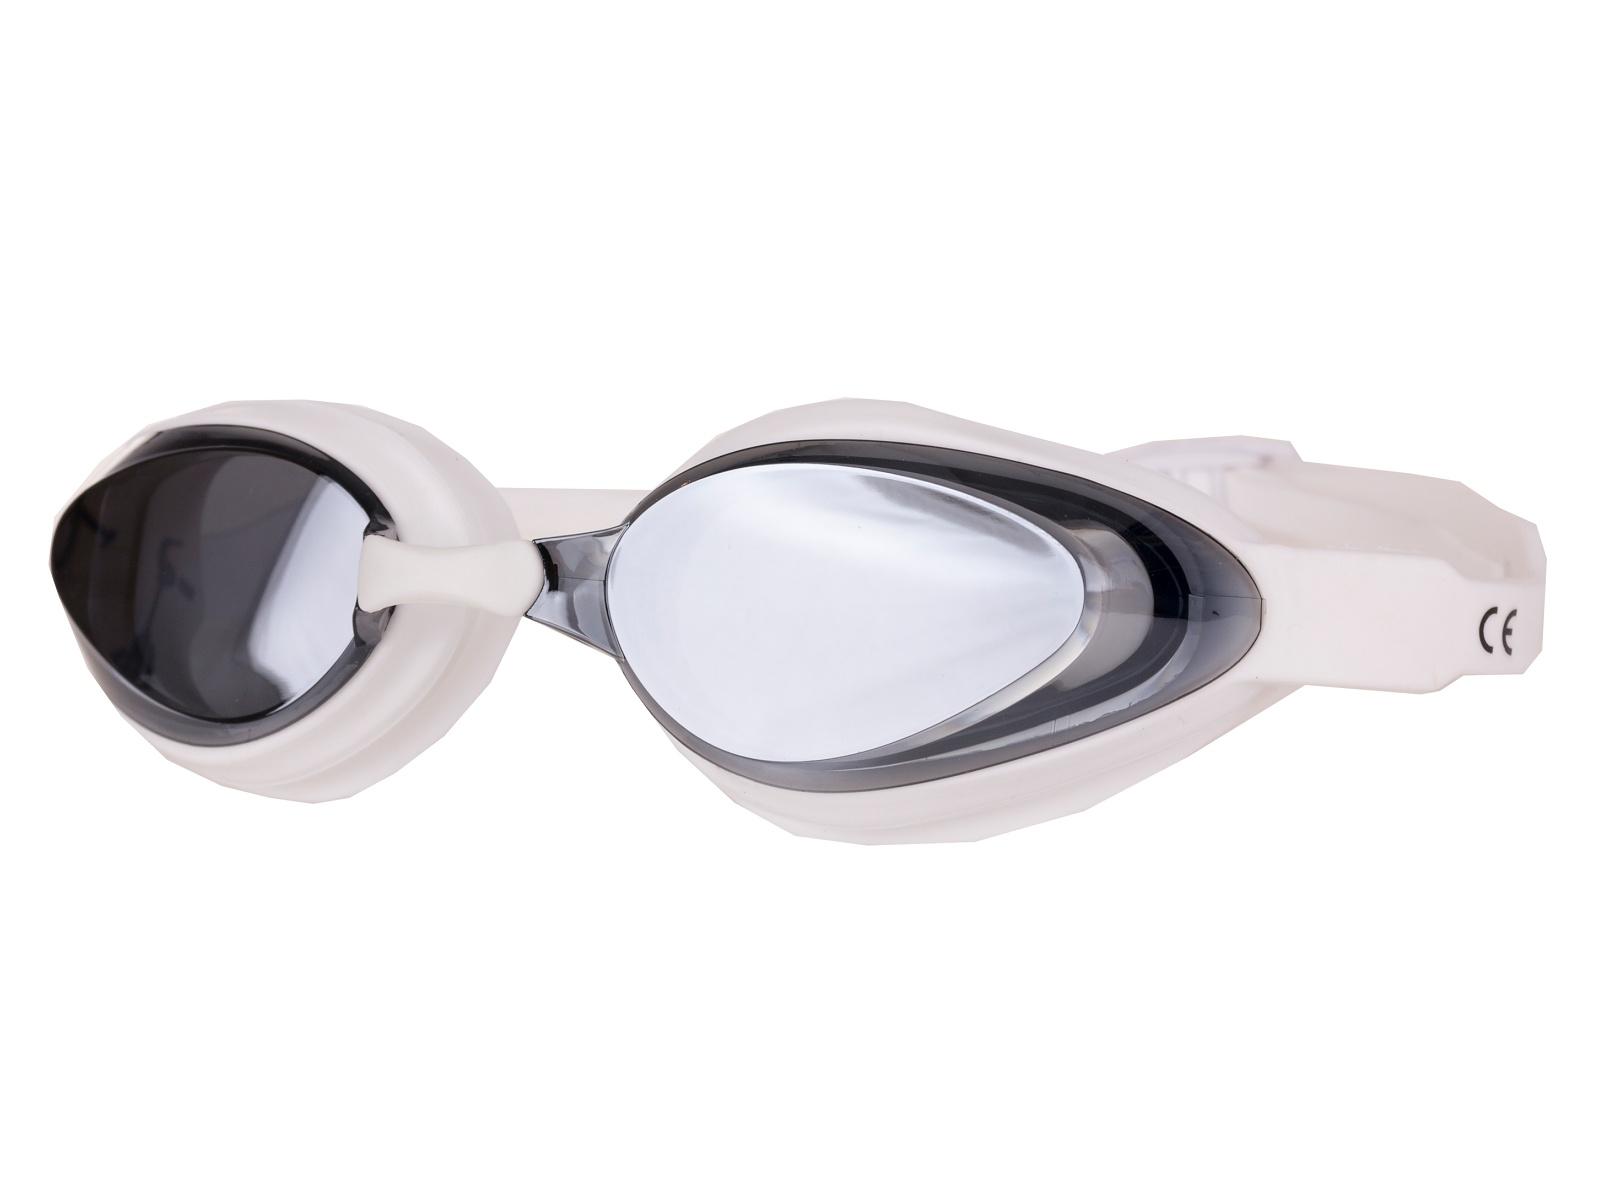 Plavecké brýle SPOKEY Nimph - šedé